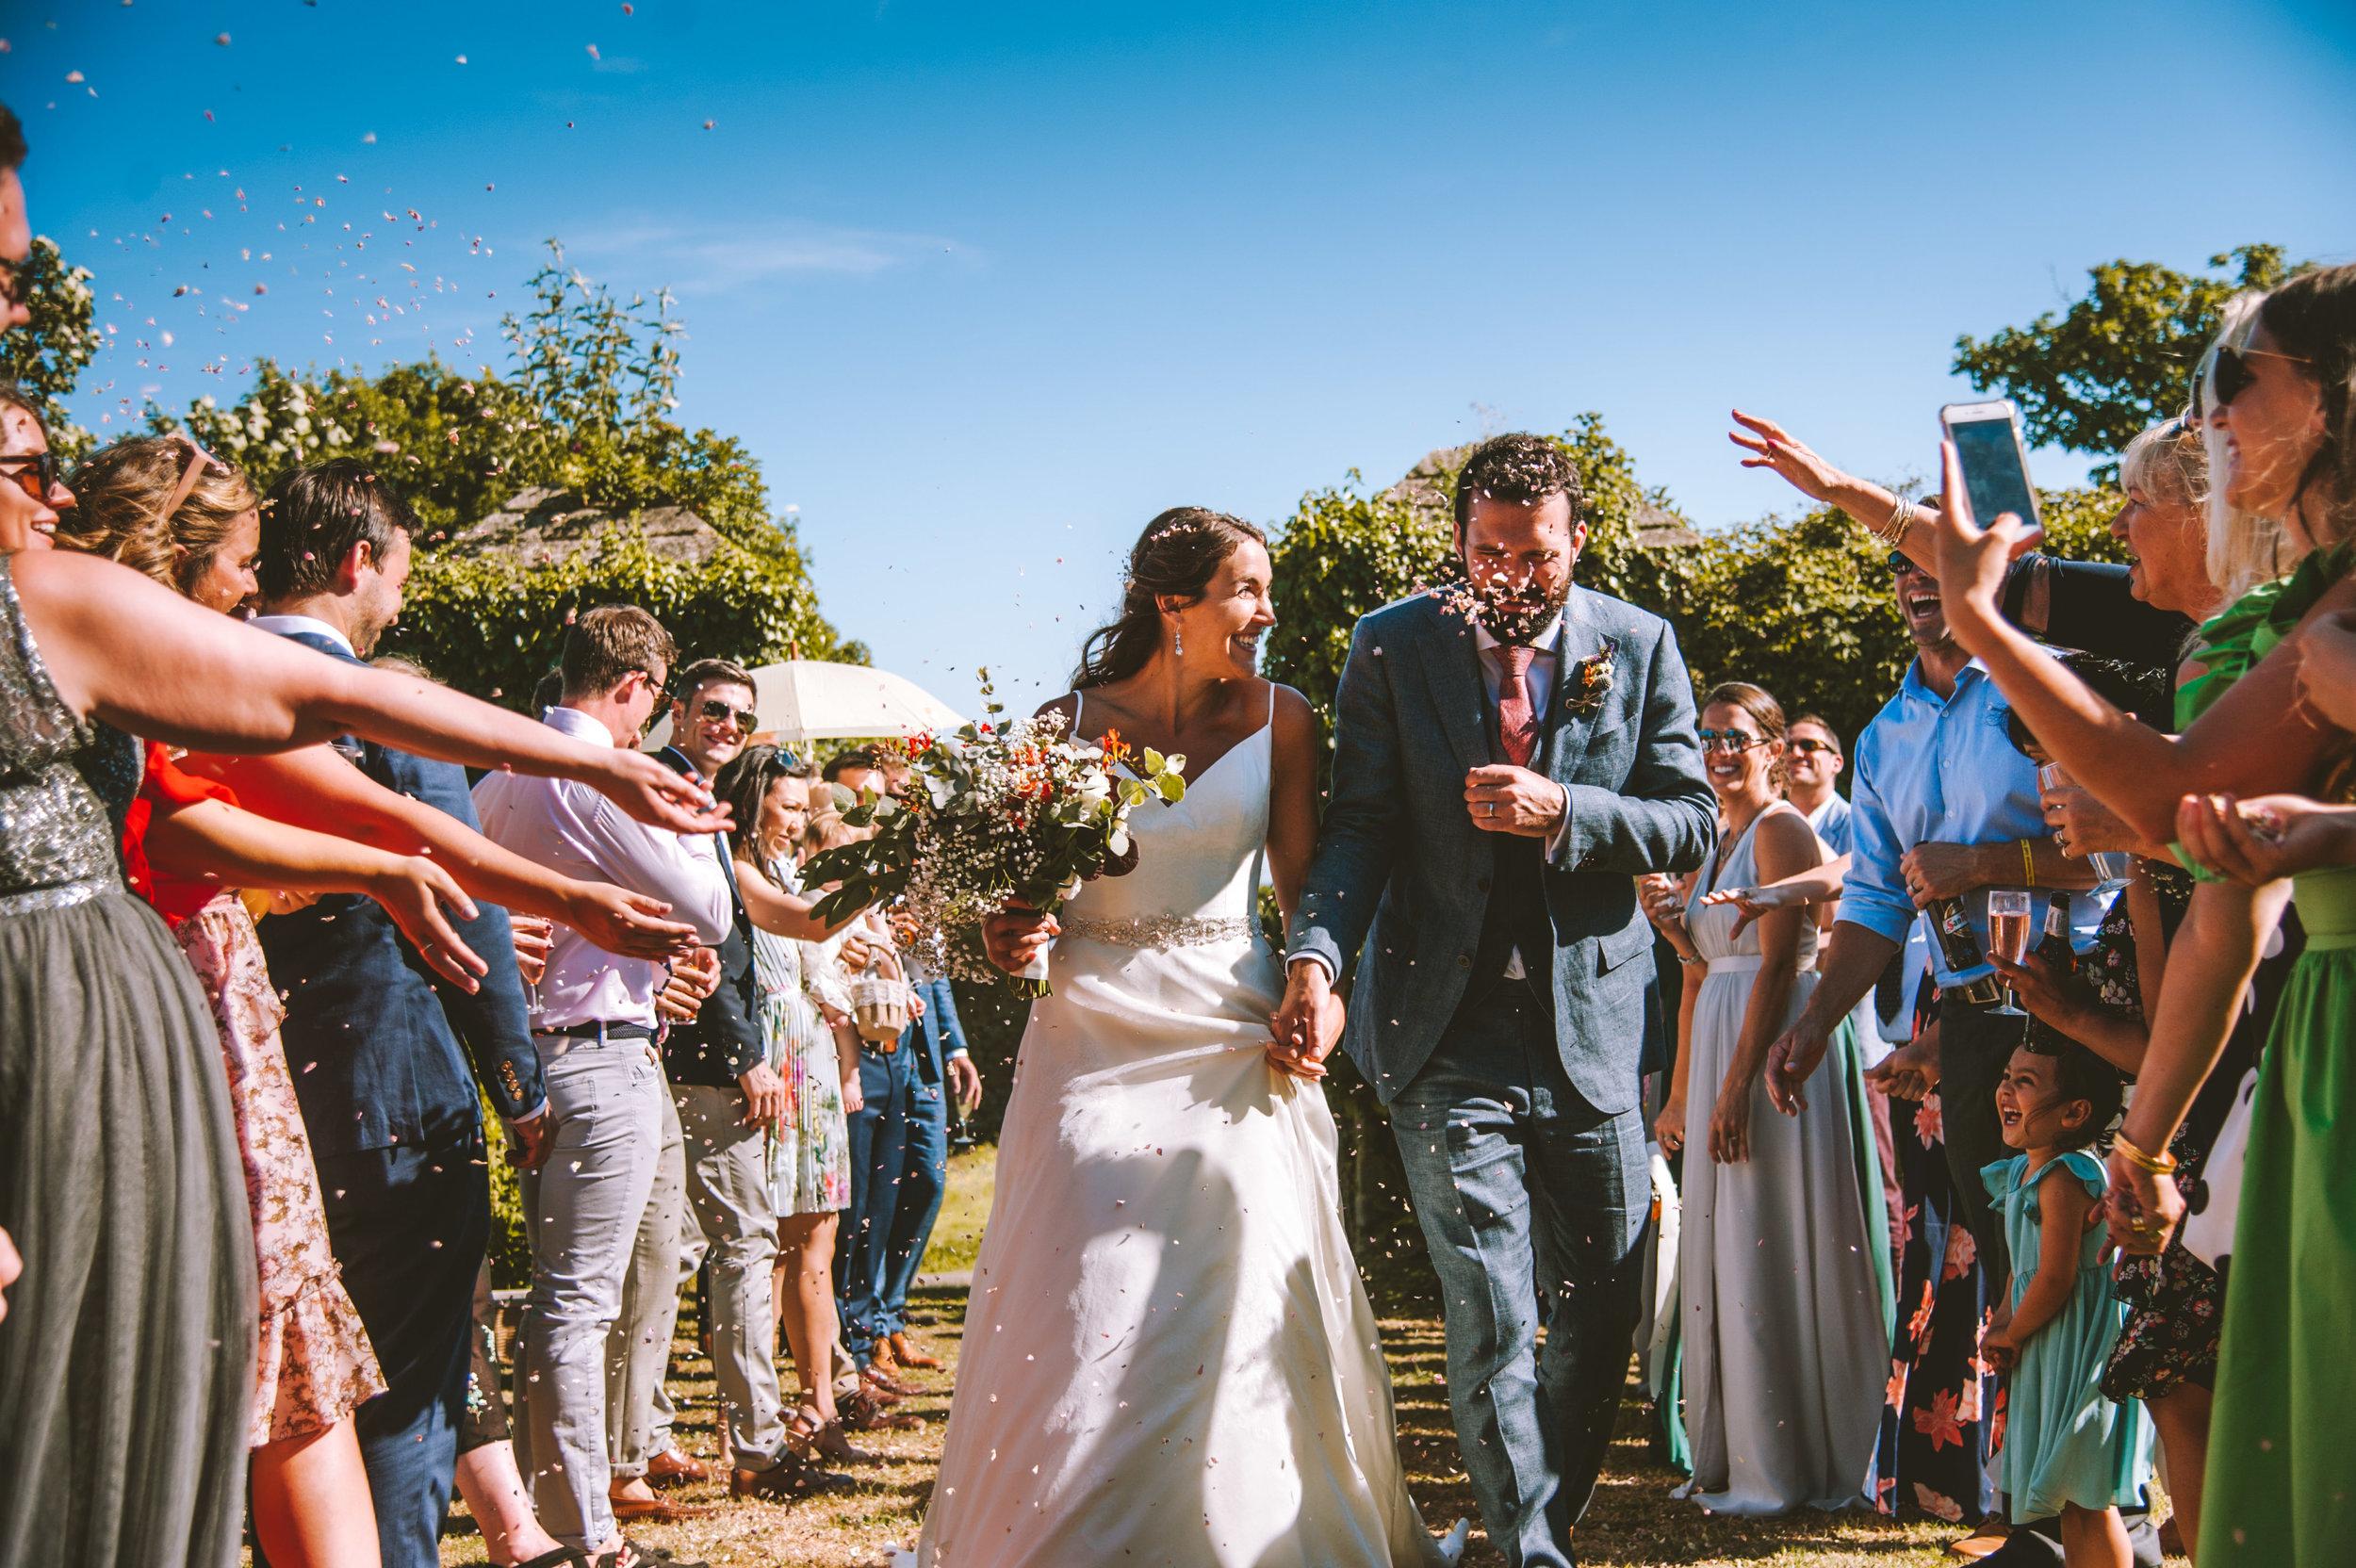 ashbarton-estate-wedding-photographer-mark-shaw-40.jpg